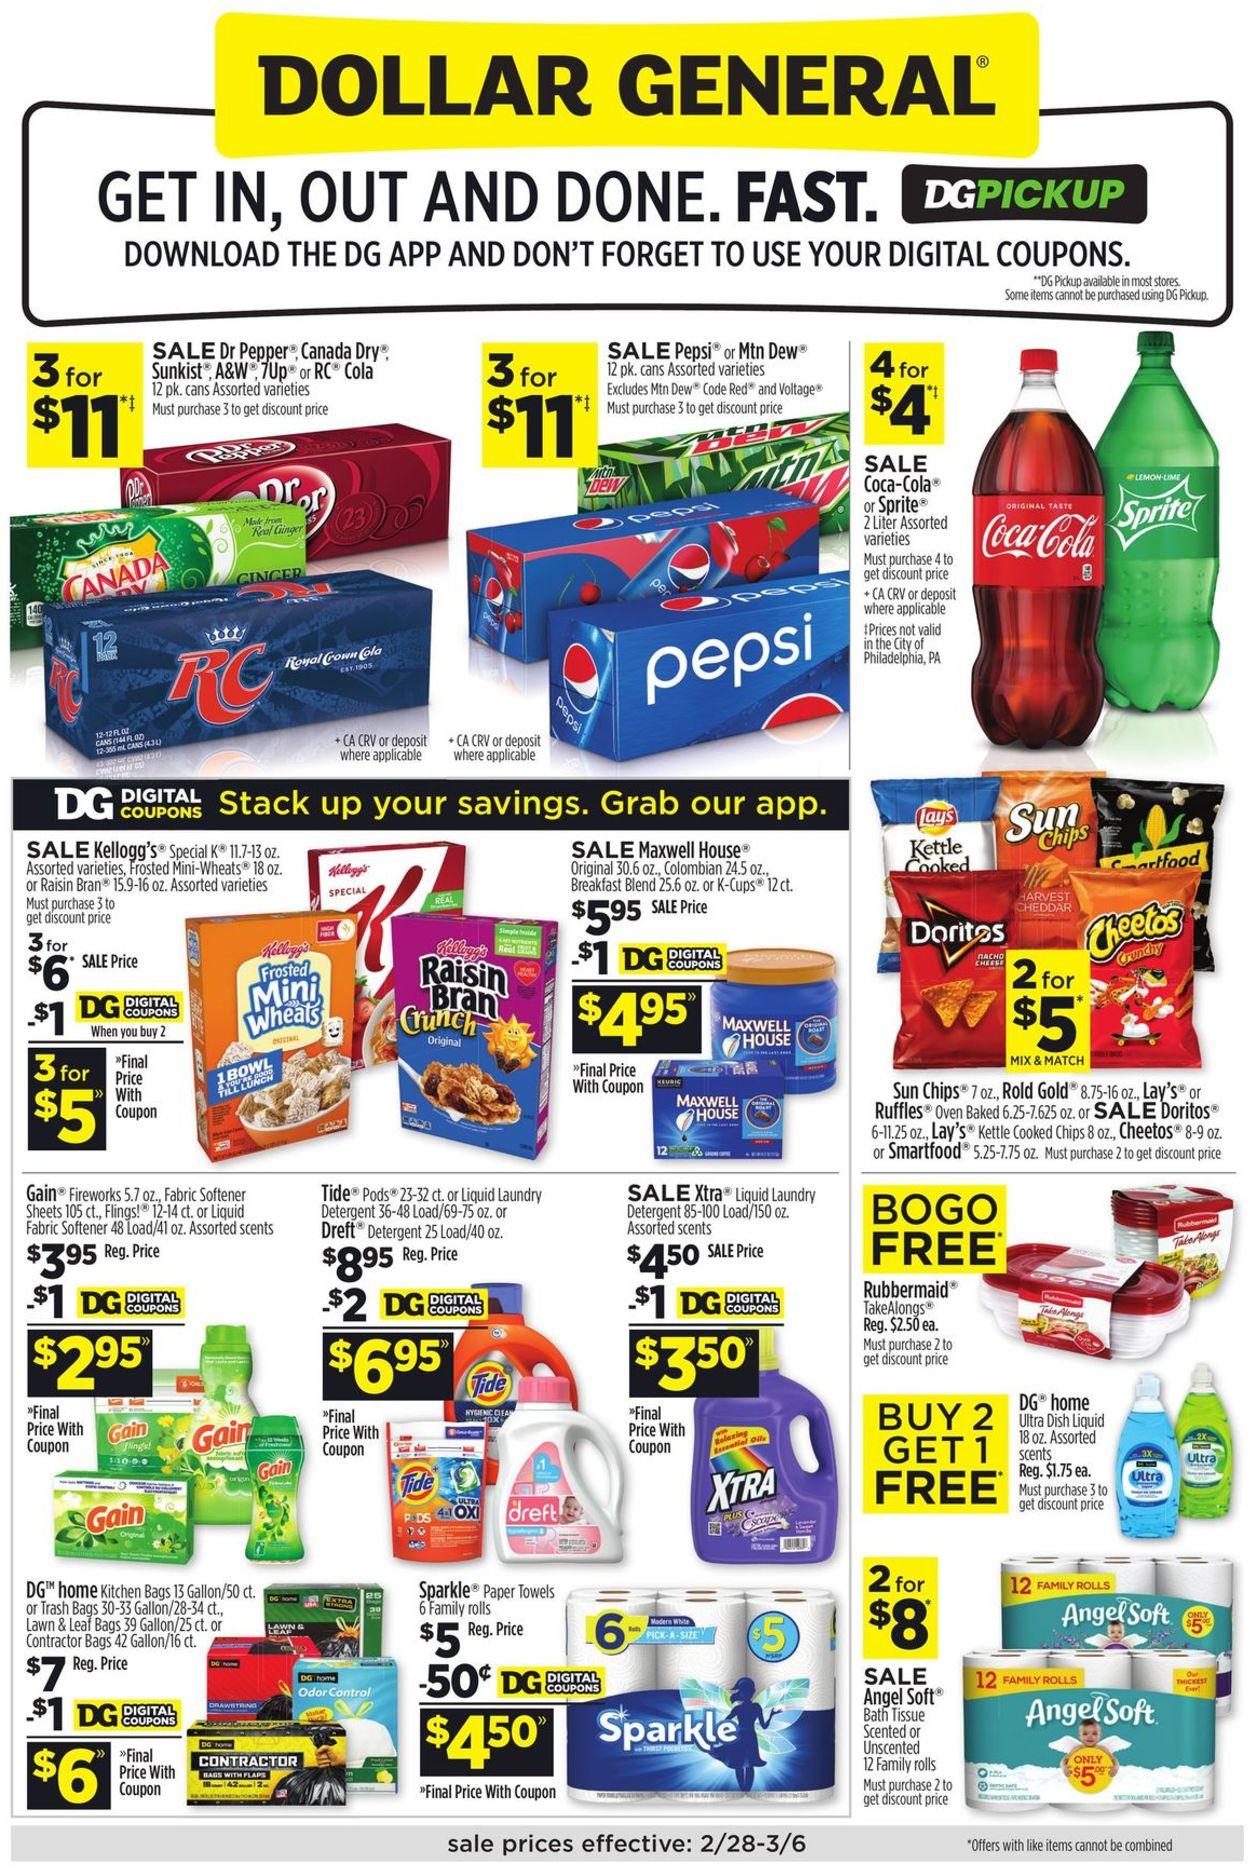 Dollar General Weekly Ad Circular - valid 02/28-03/06/2021